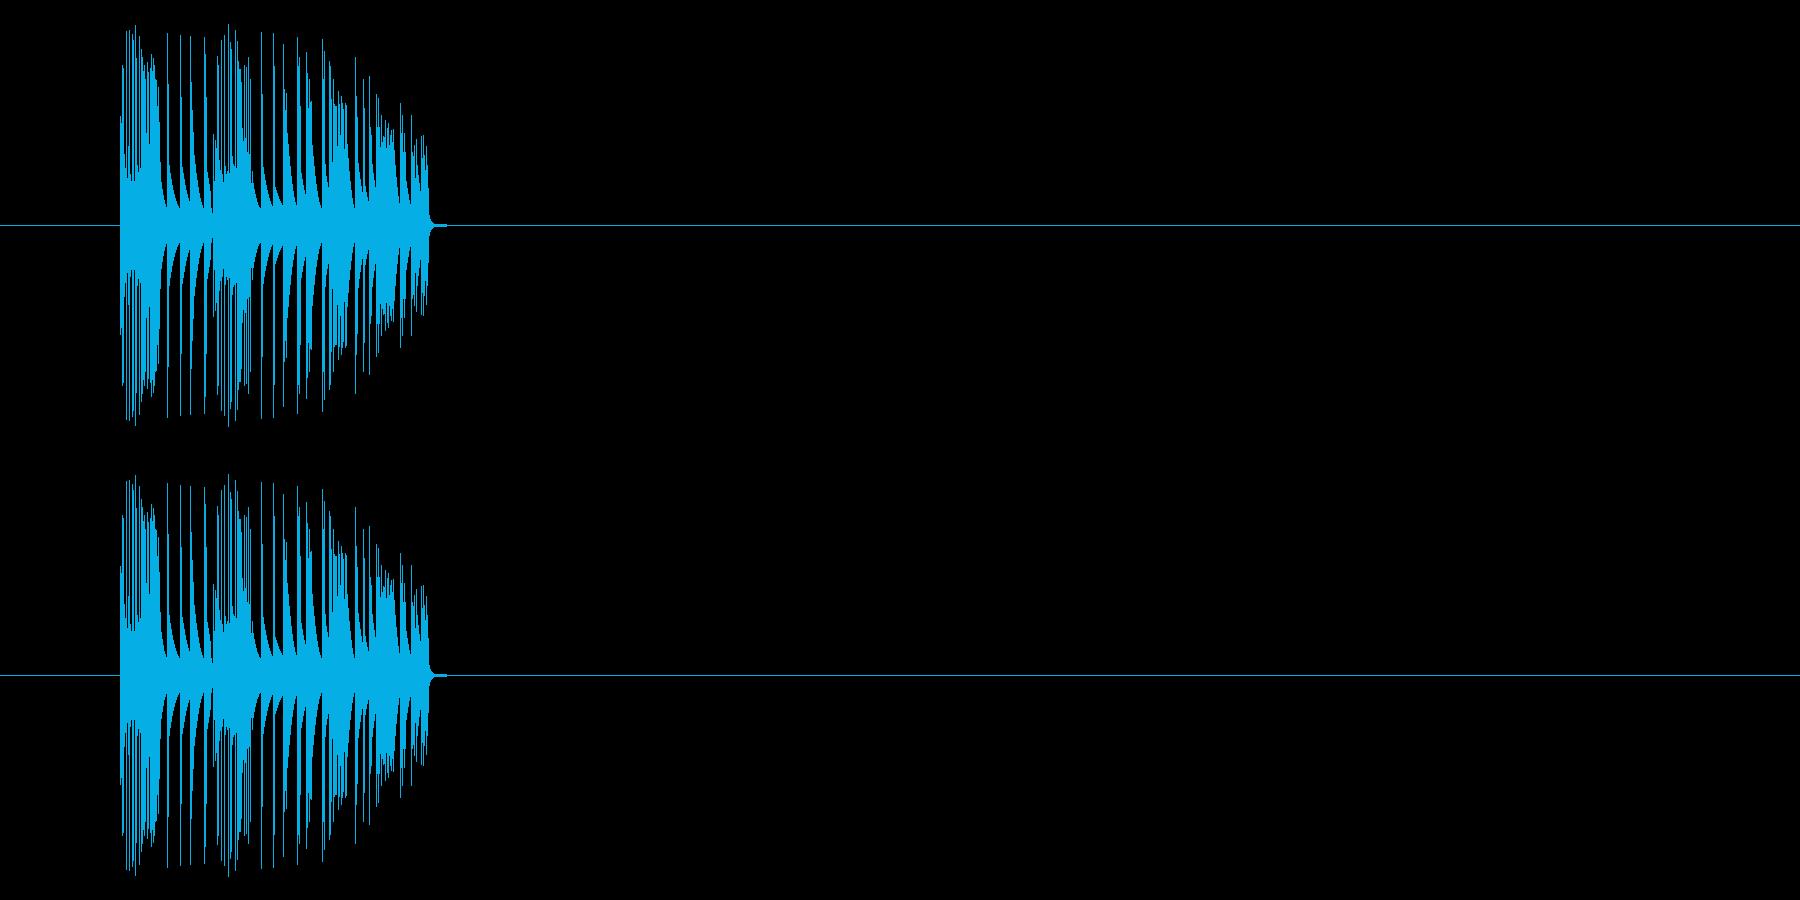 【GB 格闘01-03(倒れる)】 の再生済みの波形